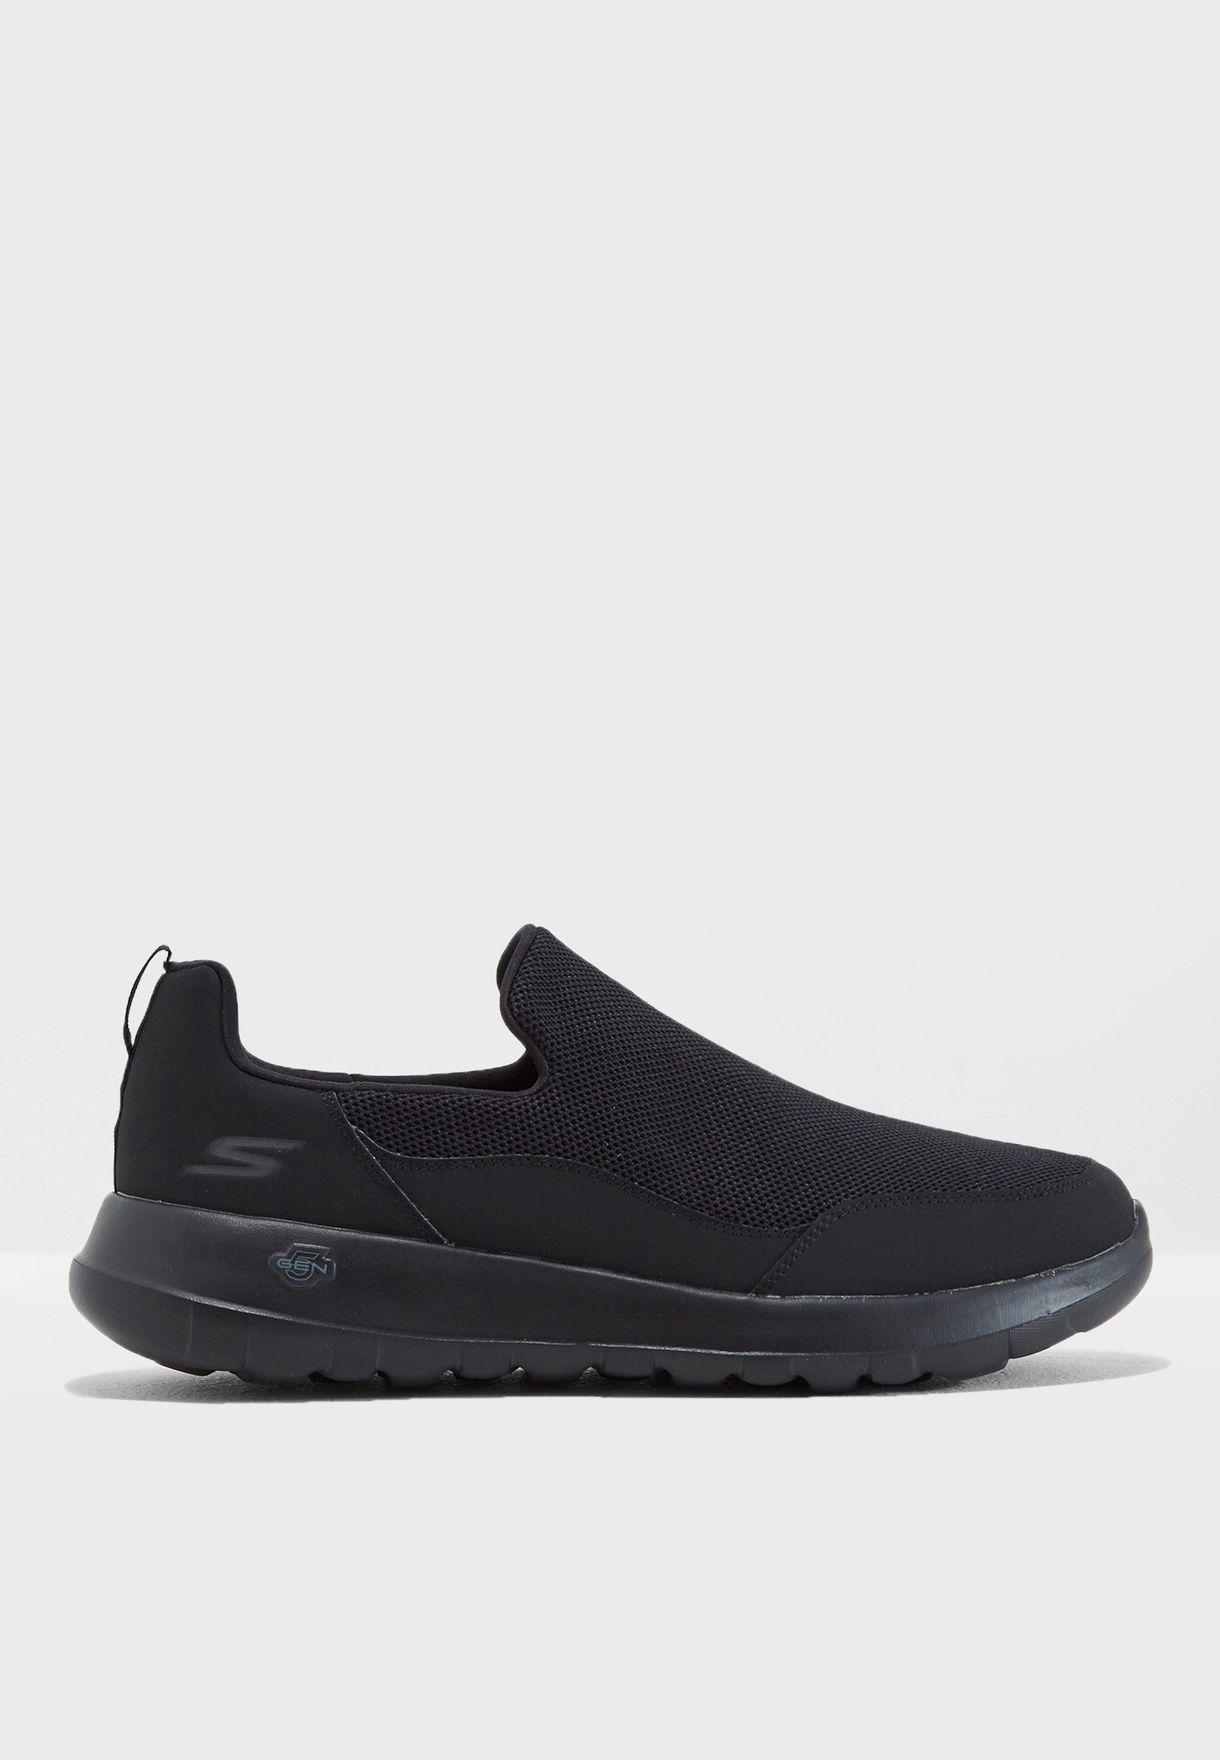 Skechers Mens Go Walk Max 54626 Sneaker